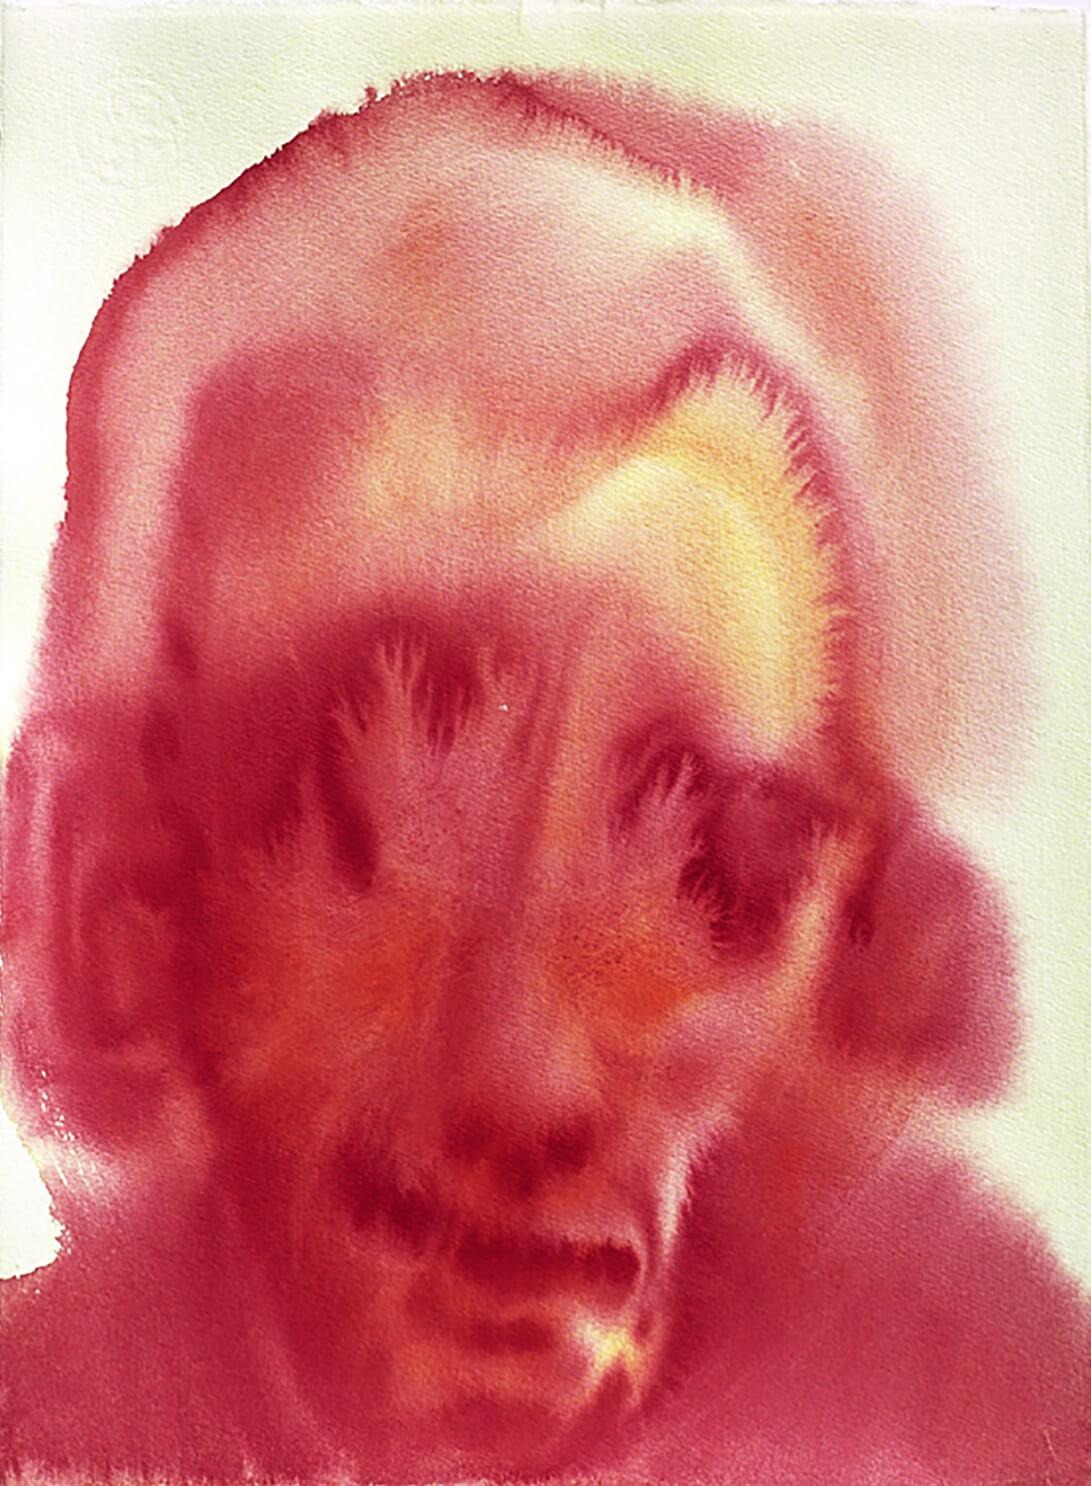 untitled (eye crystals), 39 x 28 cm, watercolour, 2005